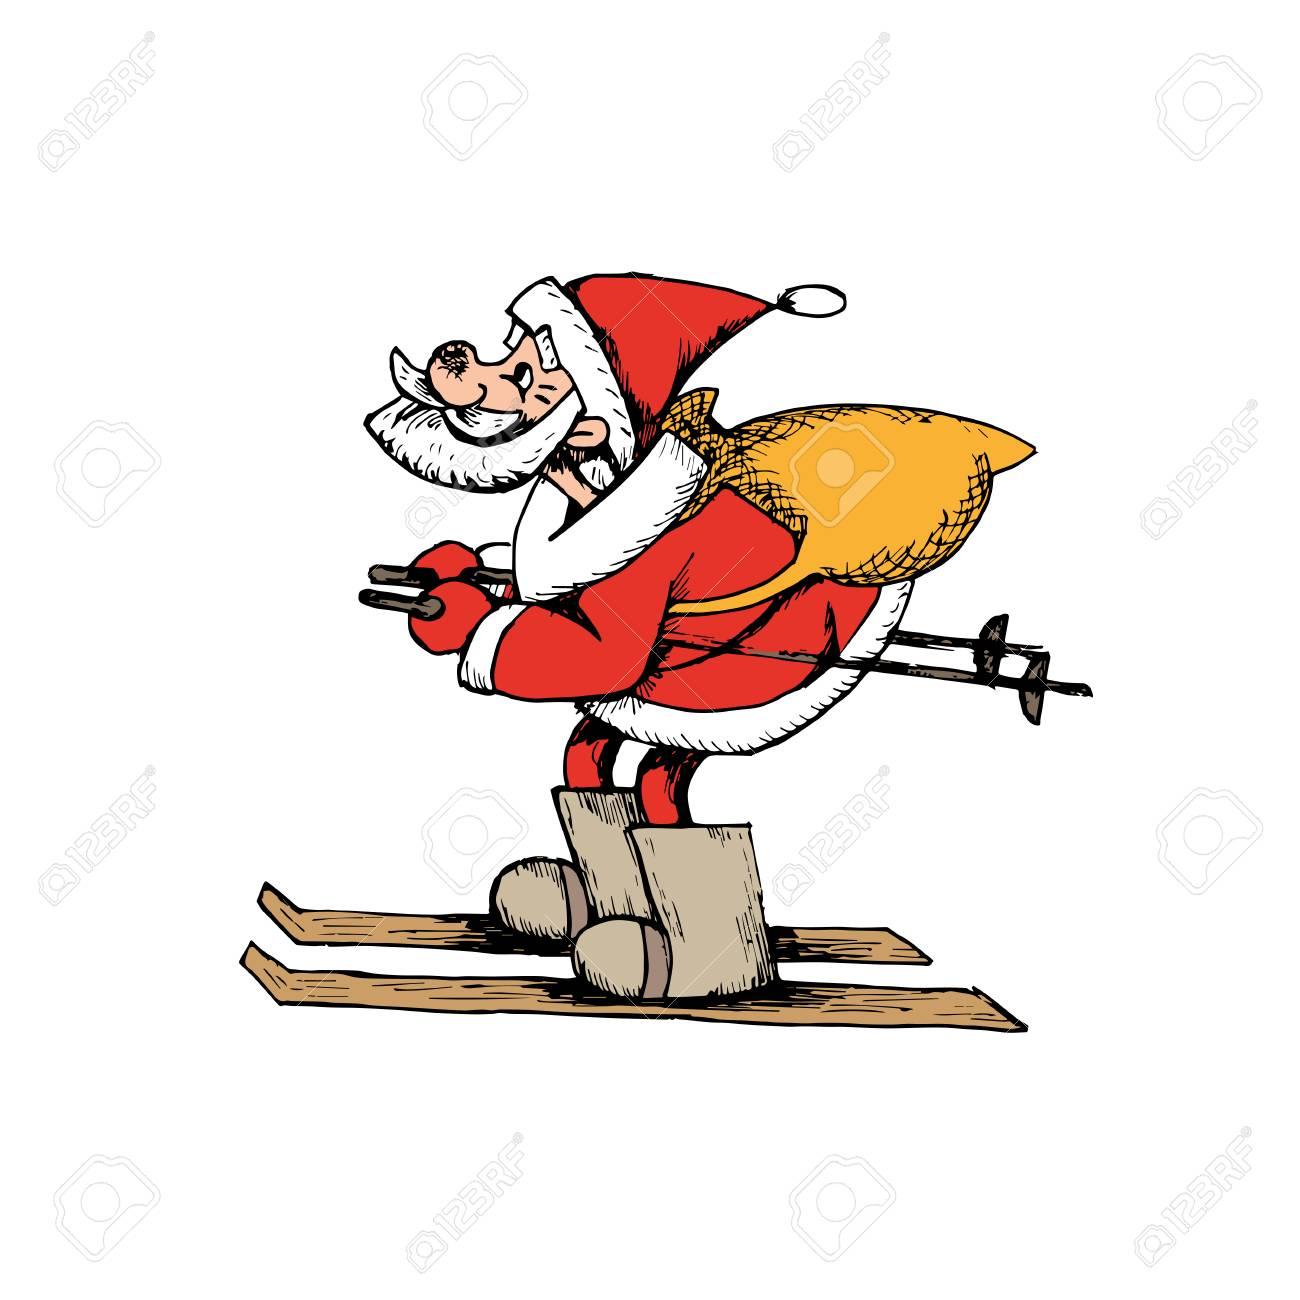 Father Christmas Cartoon Images.Santa Claus Cartoon Character Father Christmas On Ski Carrying